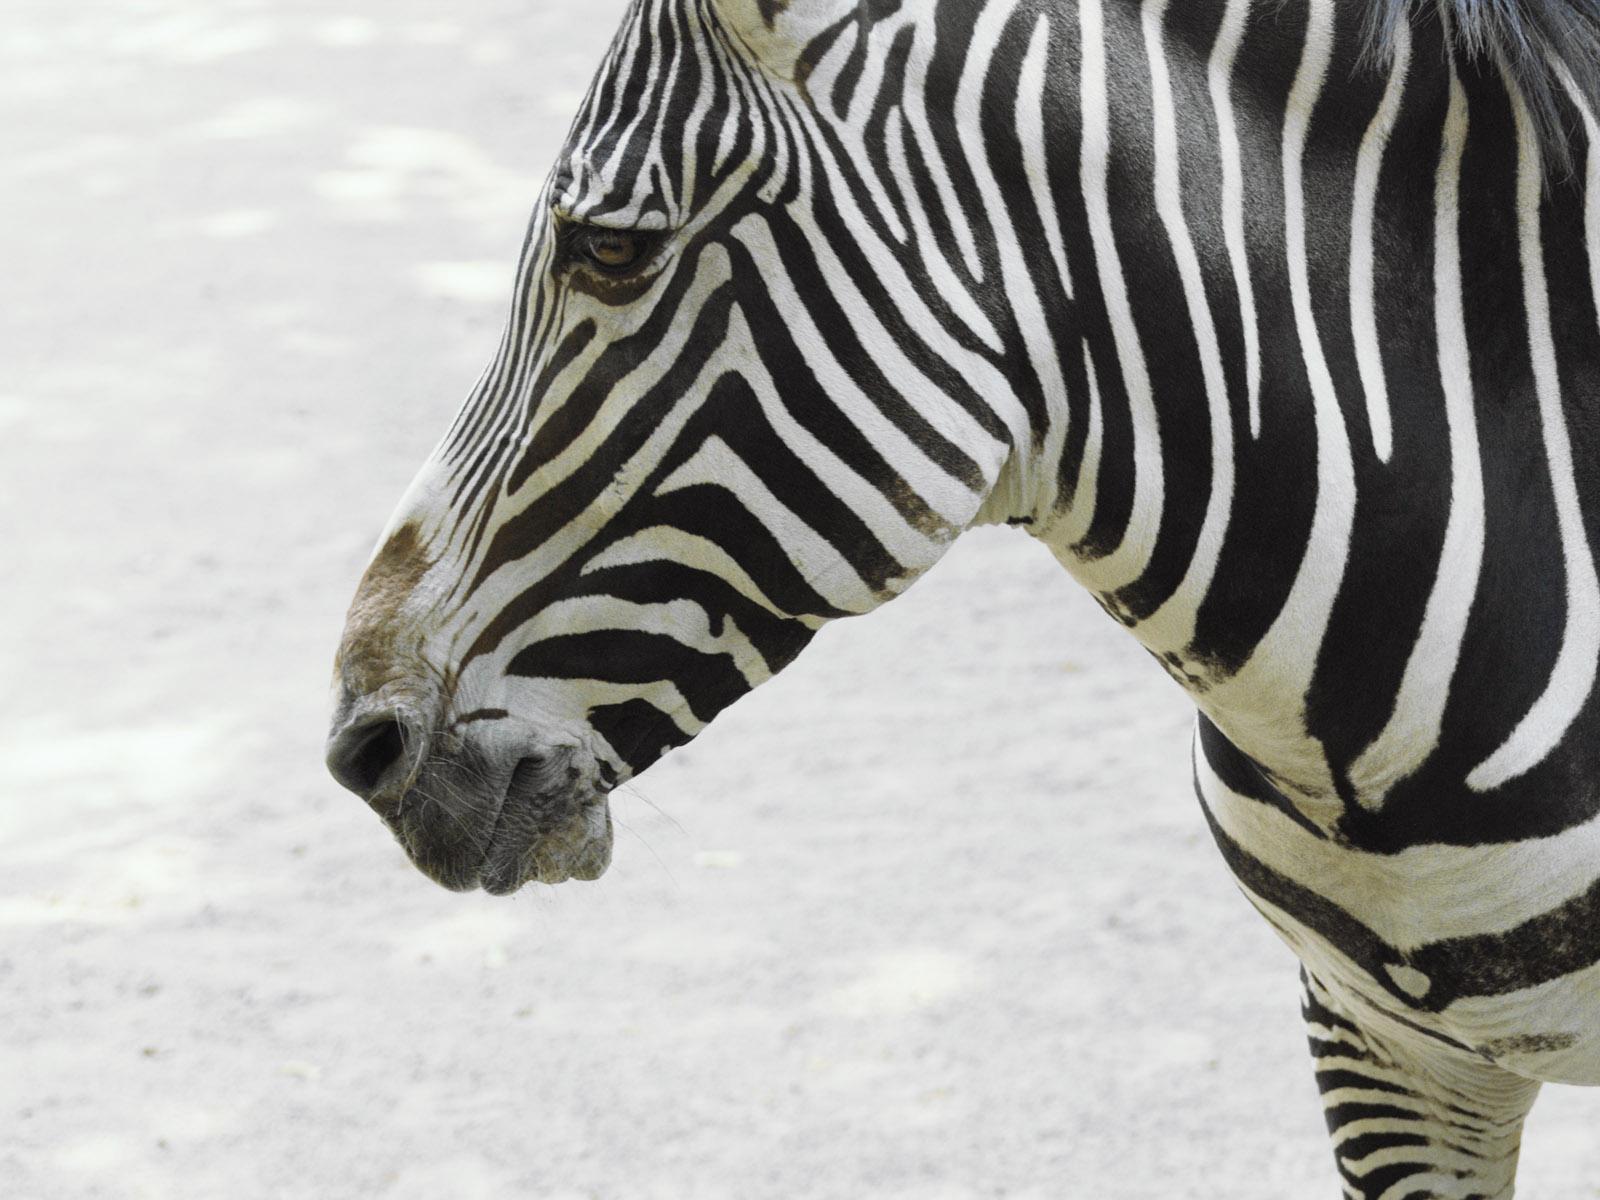 http://3.bp.blogspot.com/_sRGU_JXOz6E/TRfcete4sgI/AAAAAAAAAm4/4FfF2Jee48U/s1600/zebra+wallpaper+%252861%2529.jpg